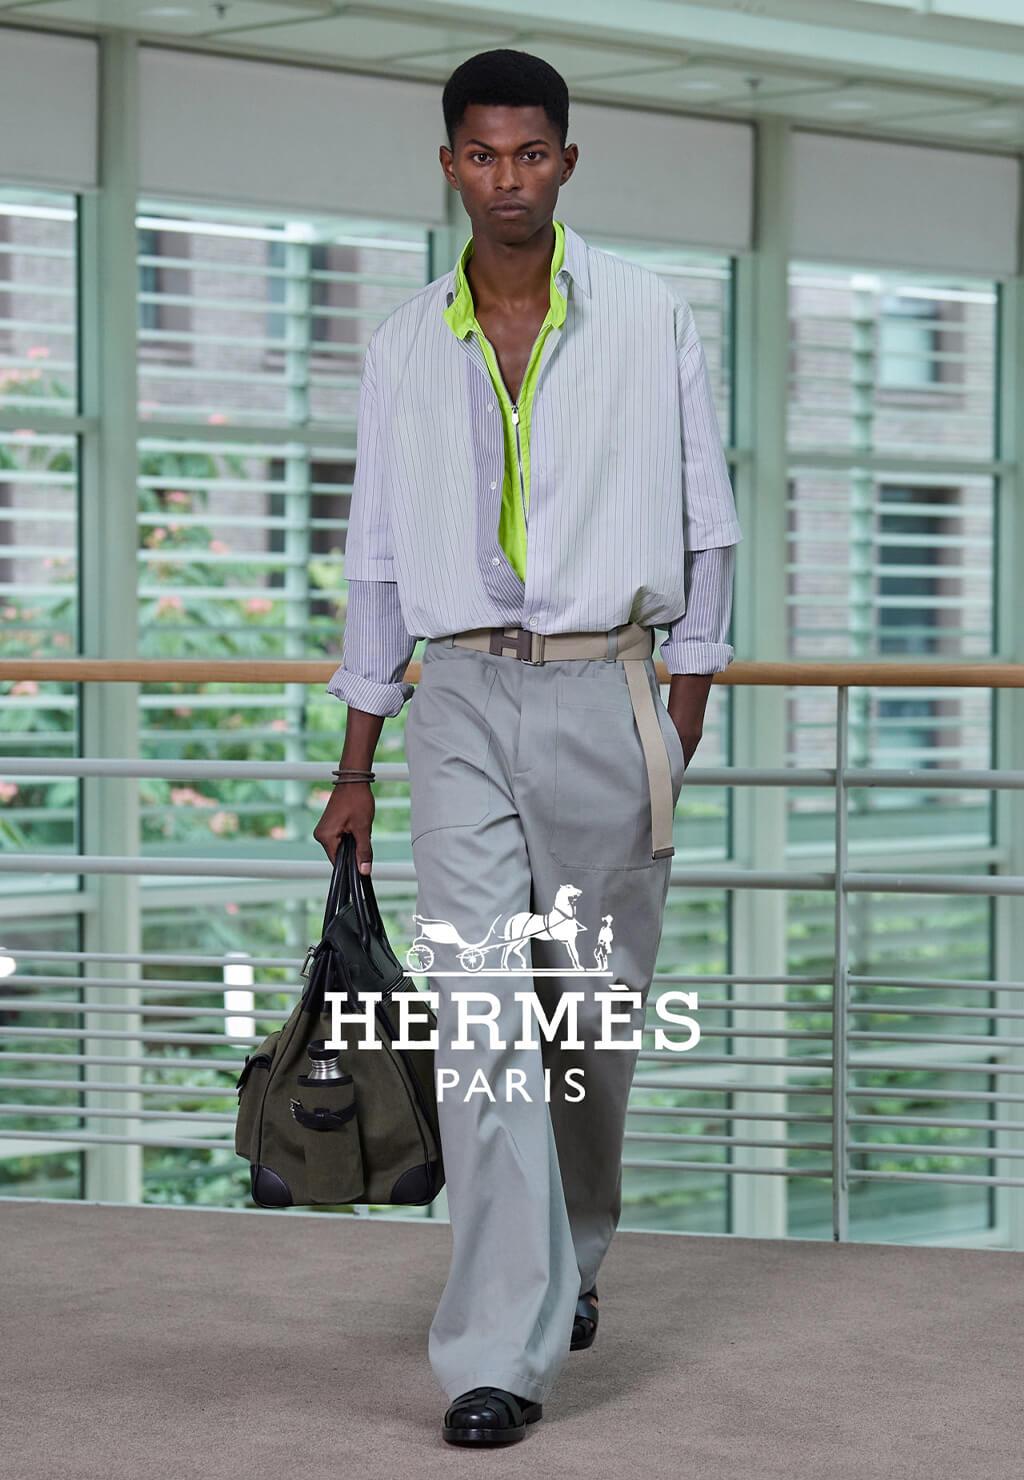 Fabio - Hermès